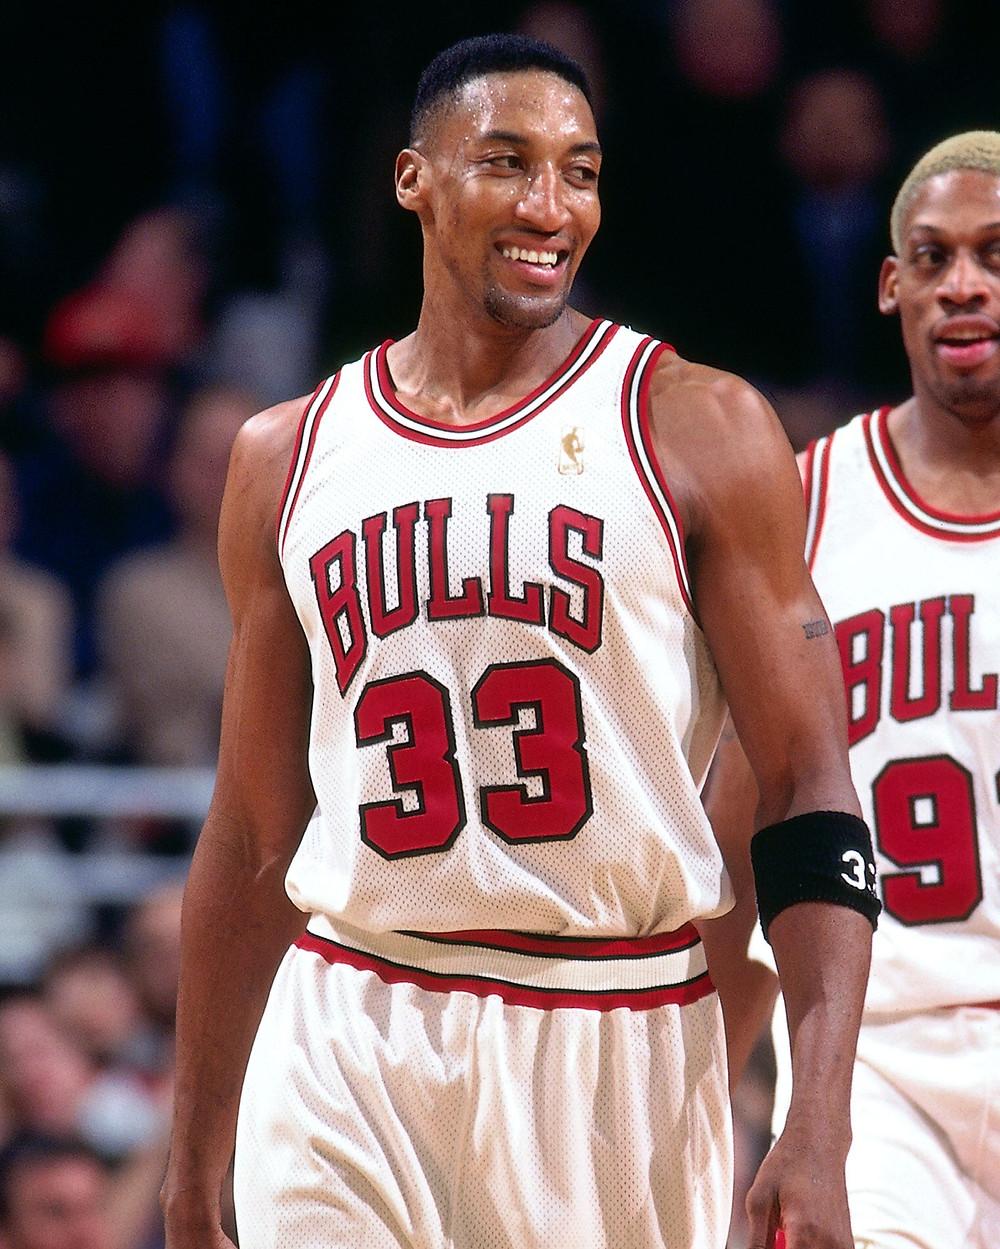 Scottie_Pippen_Chicago_Bulls_Around_the_Game